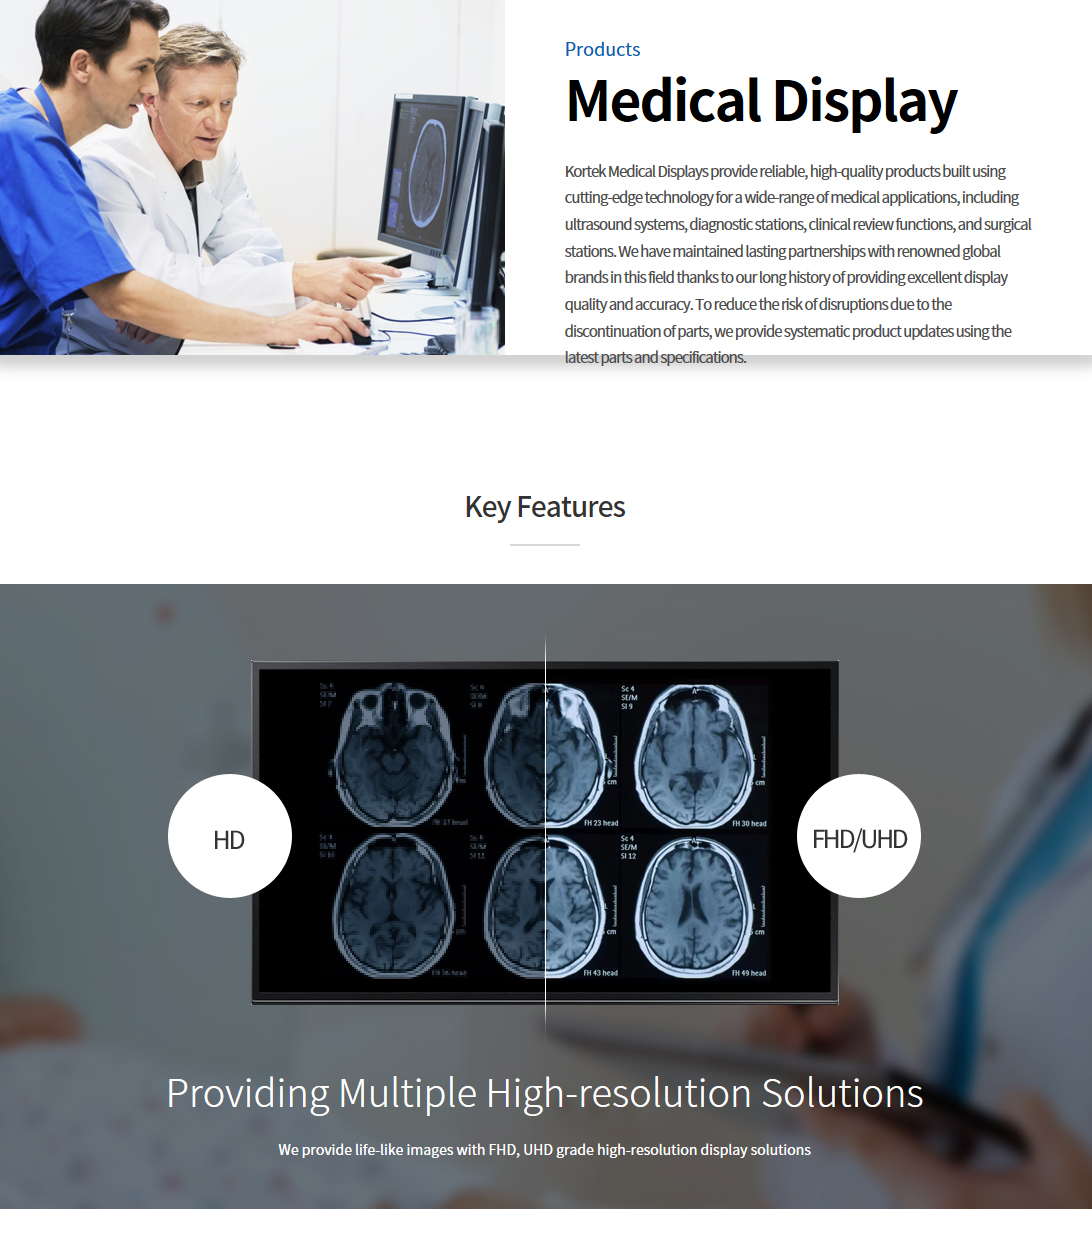 Kortek Medical Display